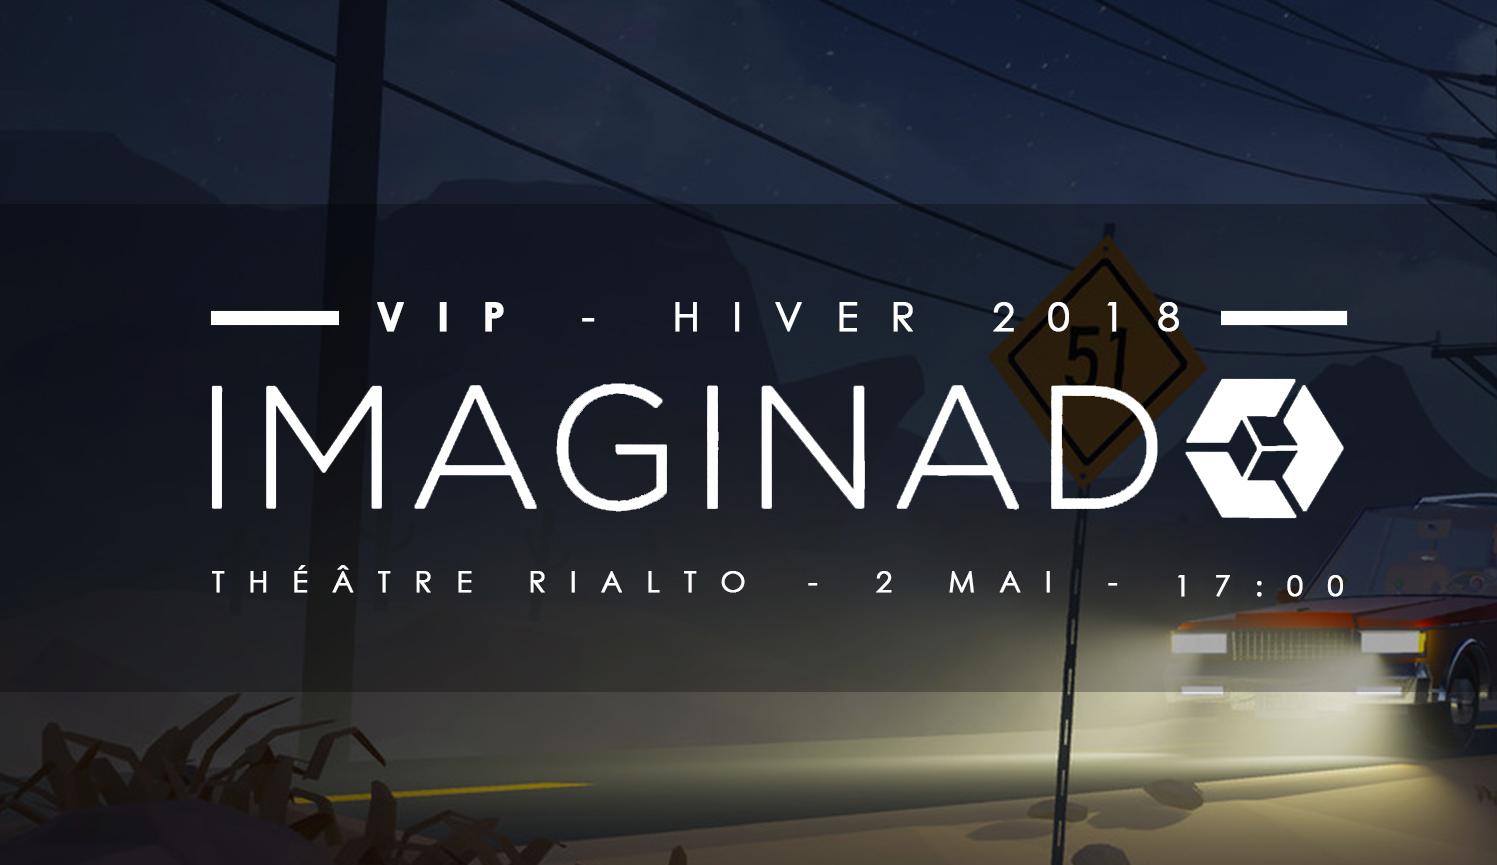 IMAGINAD -  VIP - sur invitation seulement